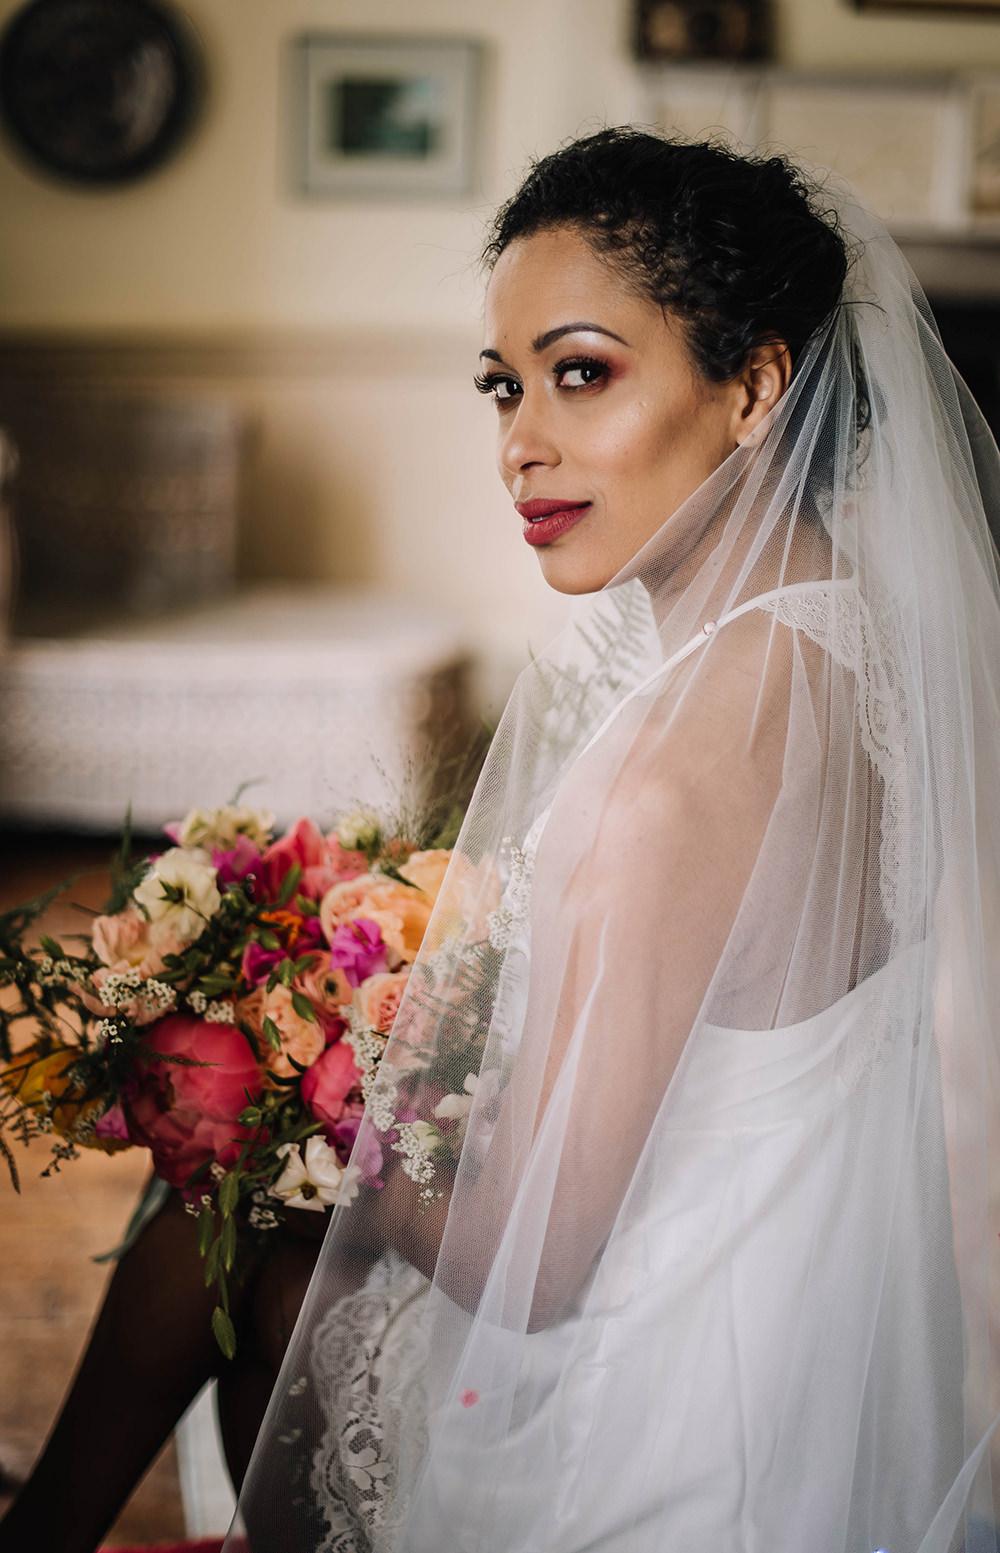 Bride Bridal Nightie Pyjamas Veil Coral Floral Wedding Ideas Birgitta Zoutman Photography